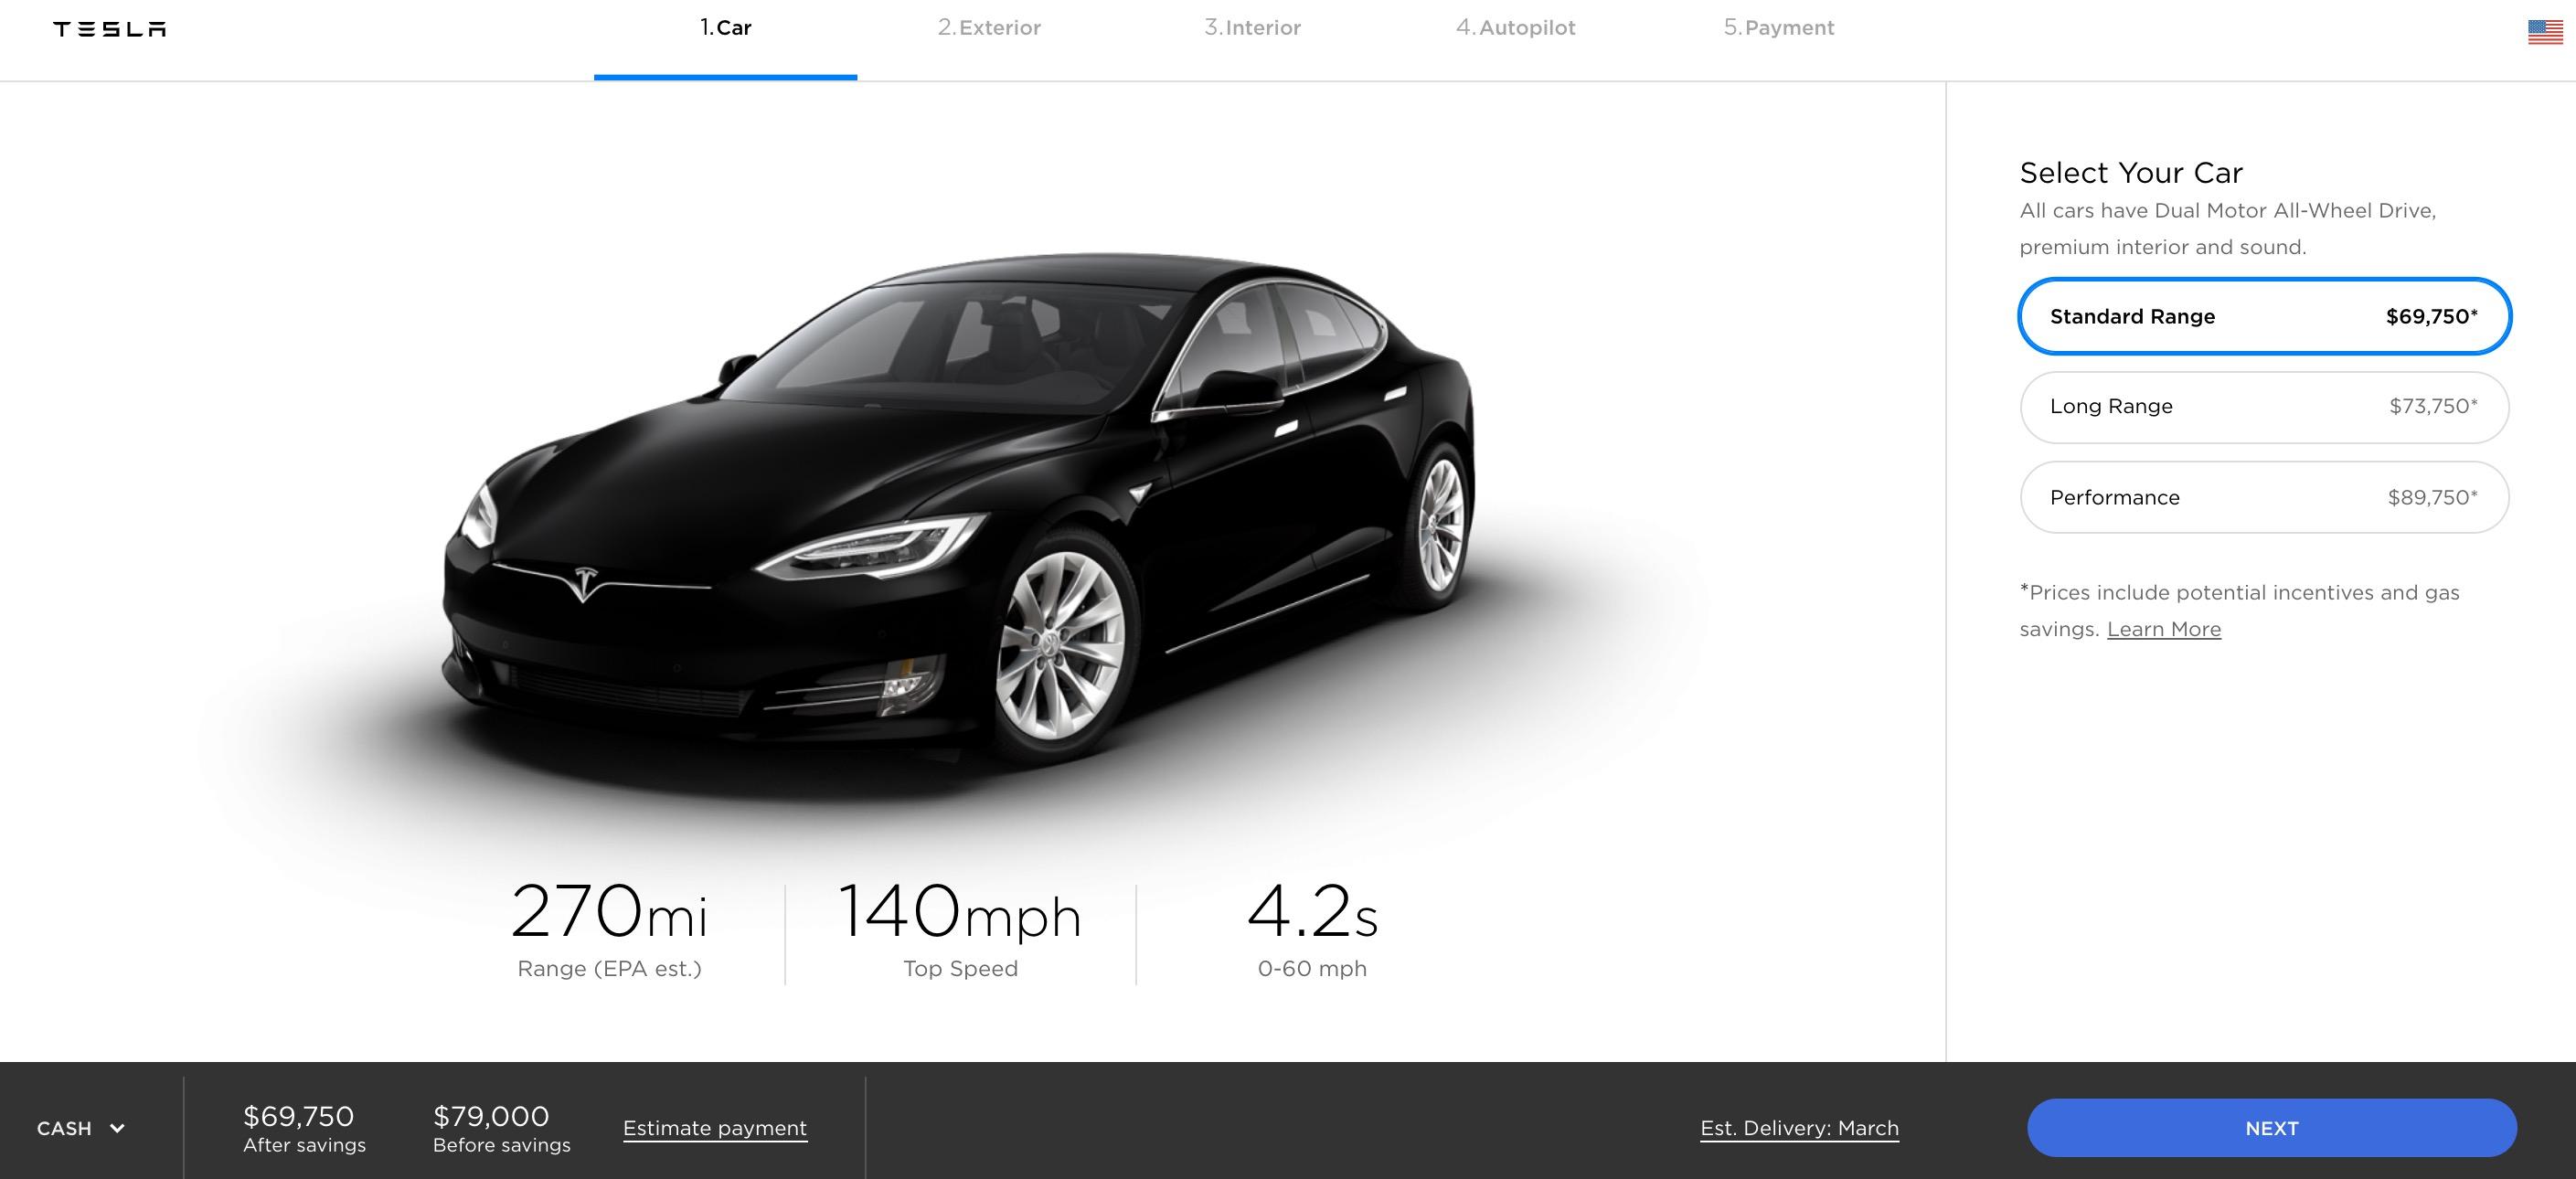 Tesla releases new Model S battery pack, makes massive ...